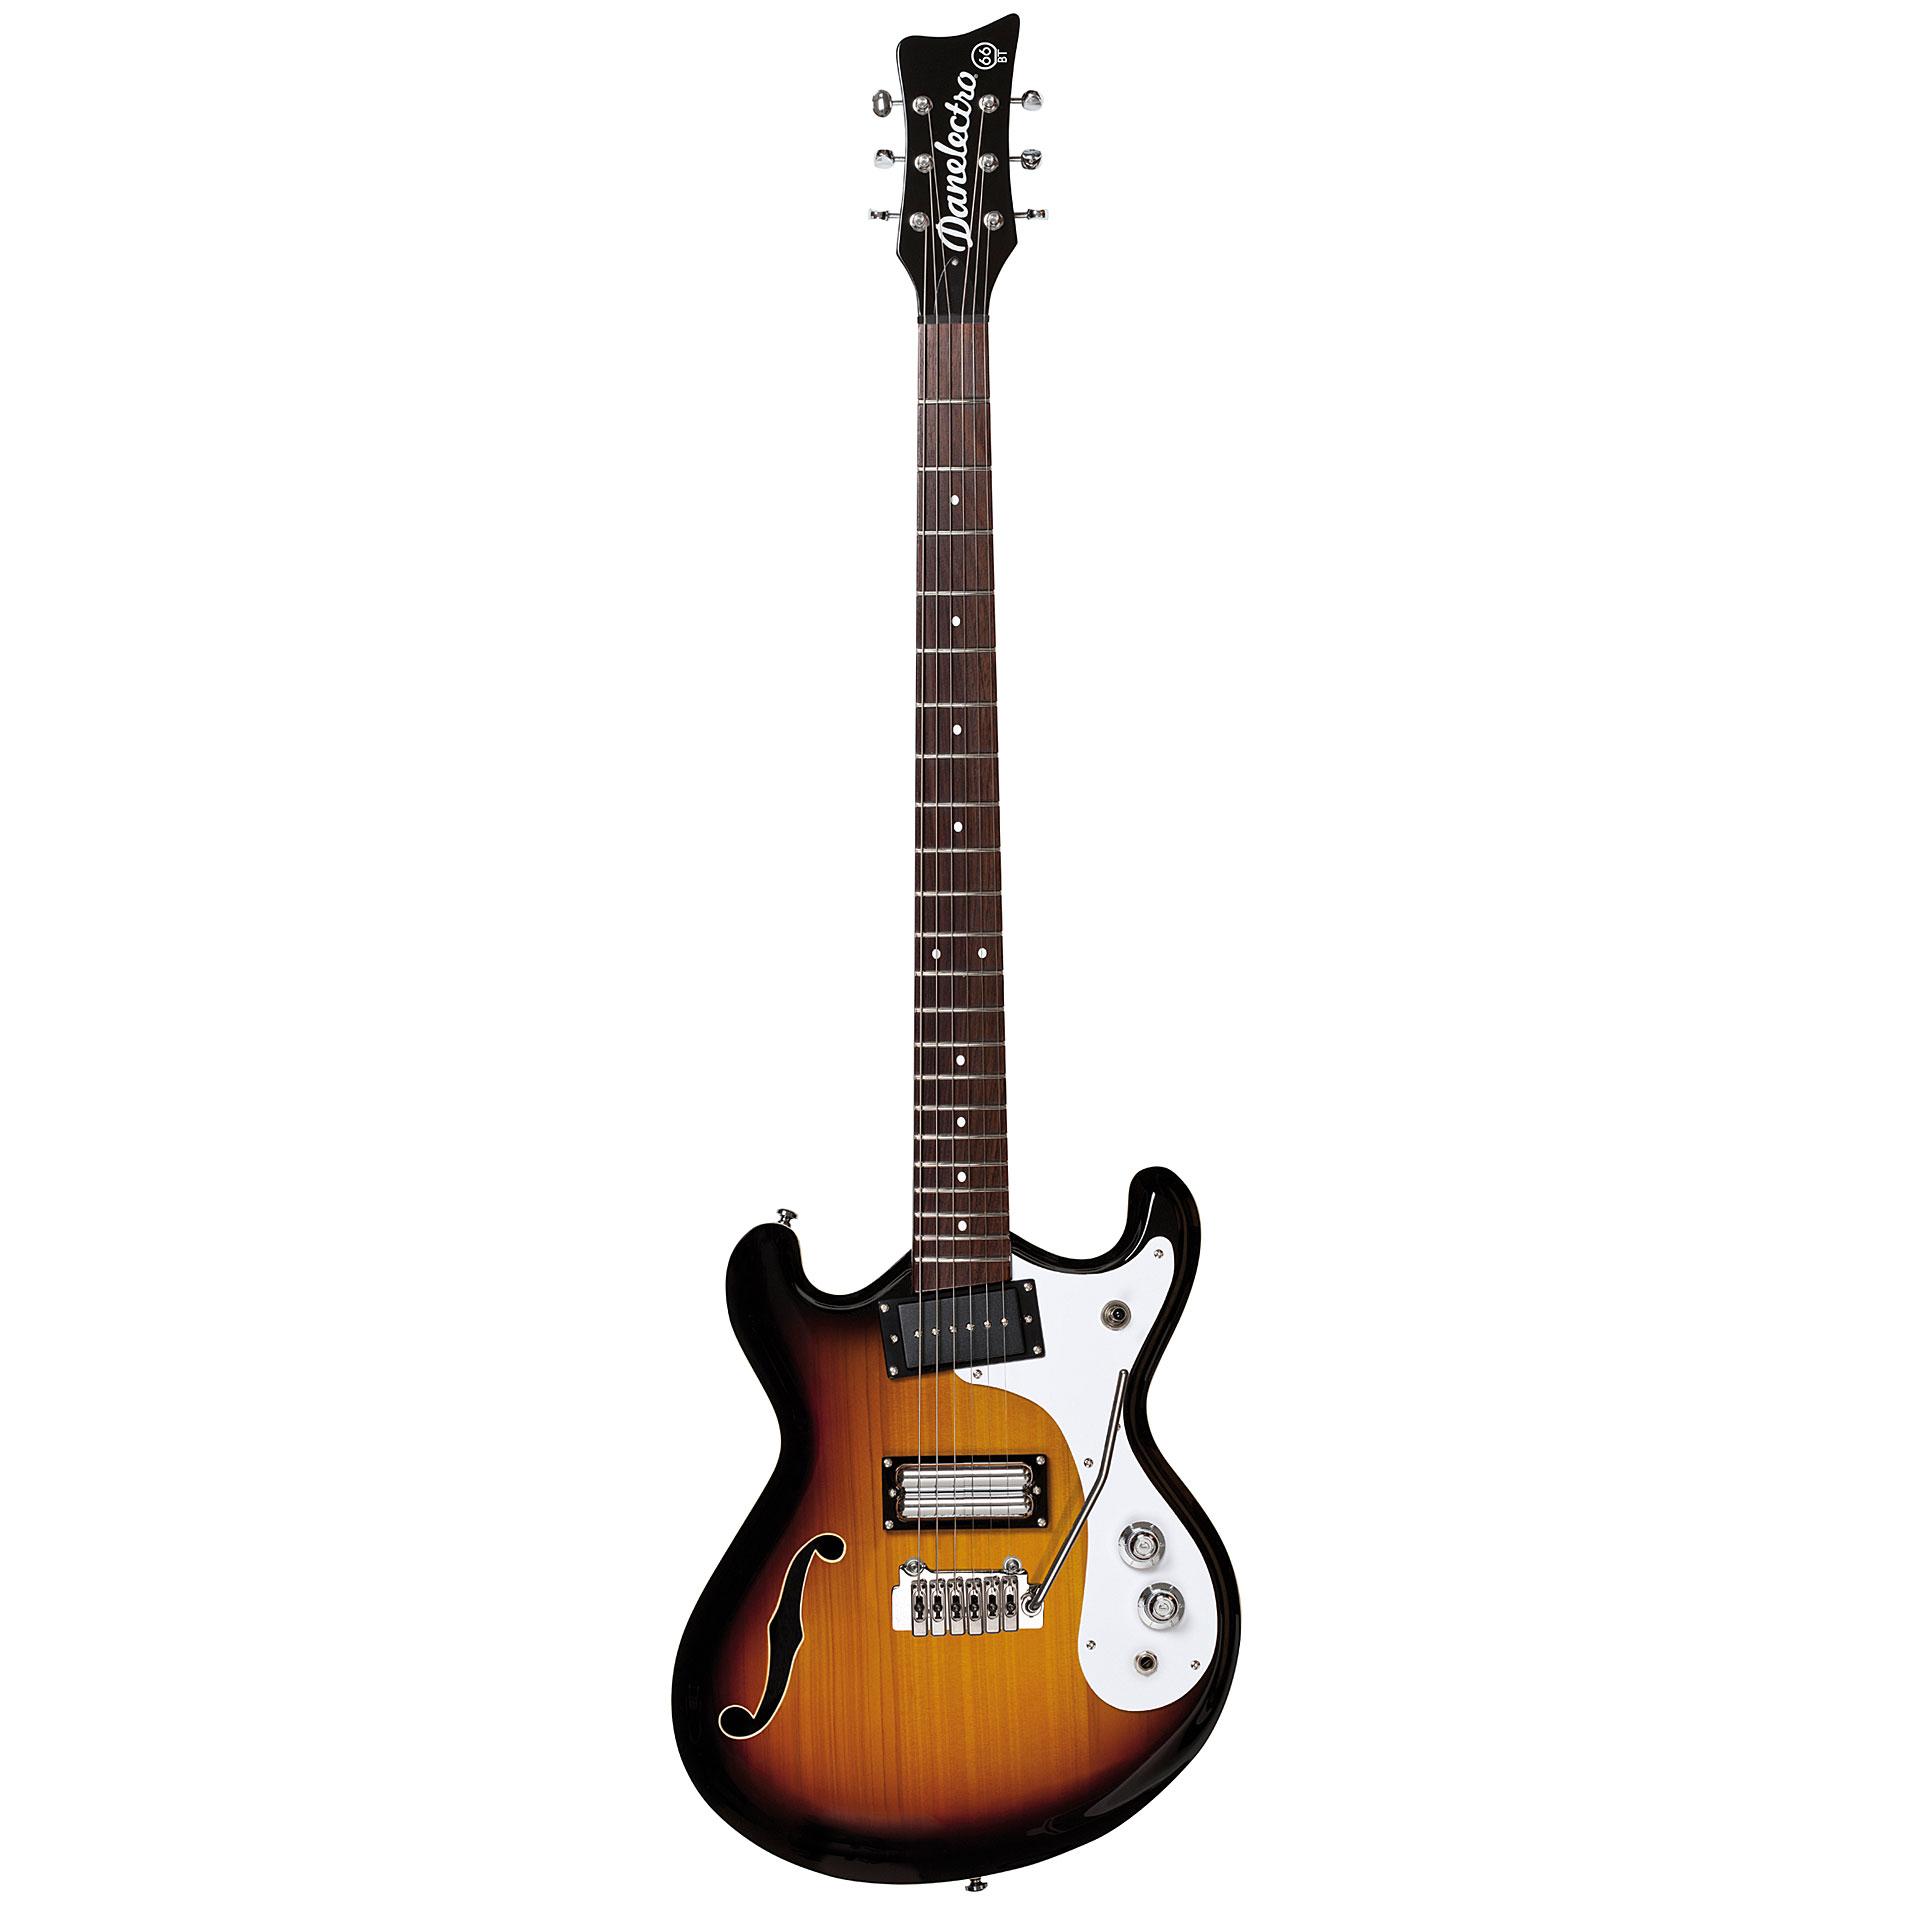 danelectro 66 bt 3ts baritone electric guitar. Black Bedroom Furniture Sets. Home Design Ideas